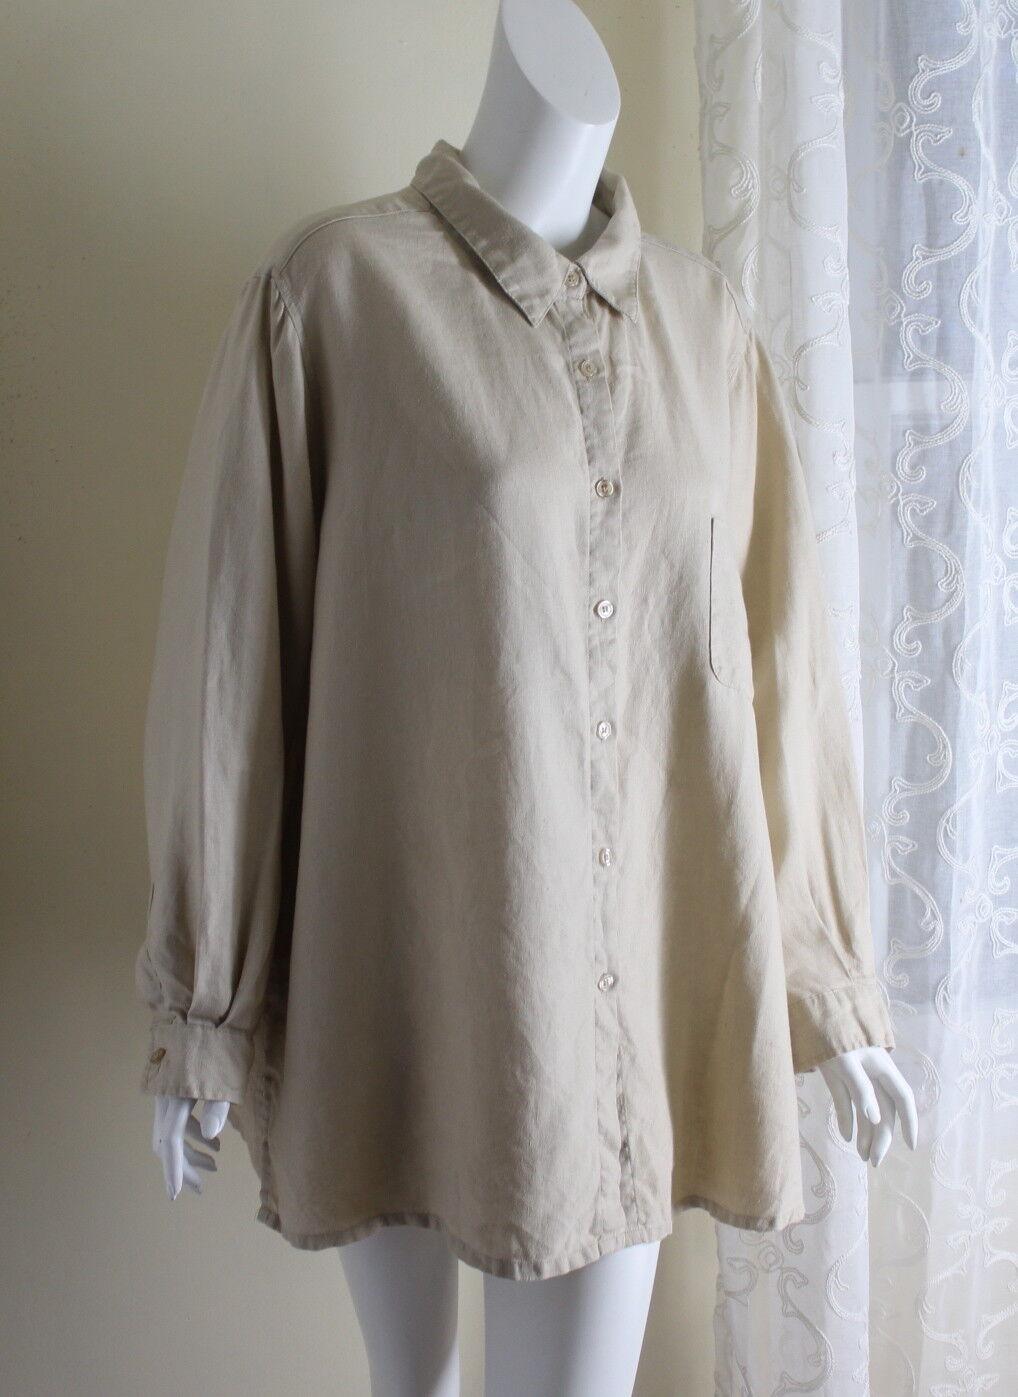 BRIDGEWATER -Sz 2X 100% Linen Natural Wheat Lagenlook Tunic Breezy Shirt Jacket